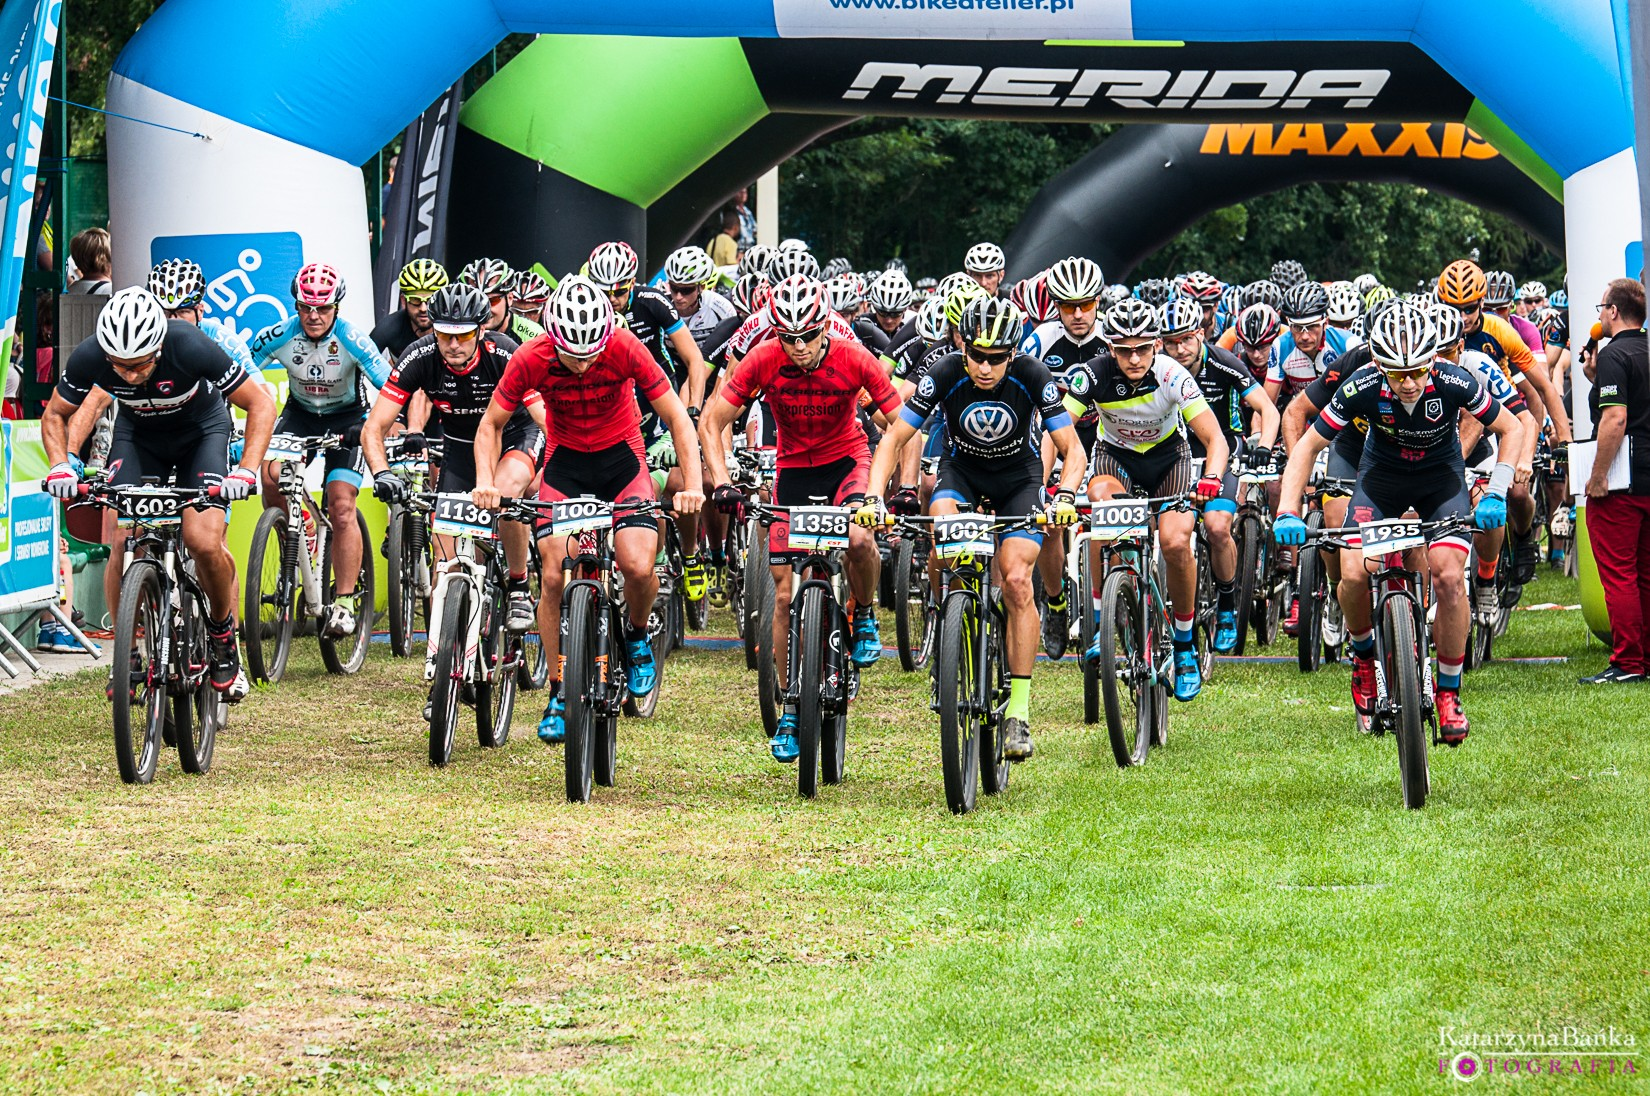 Bike Atelier Maraton już 20 sierpnia w Psarach